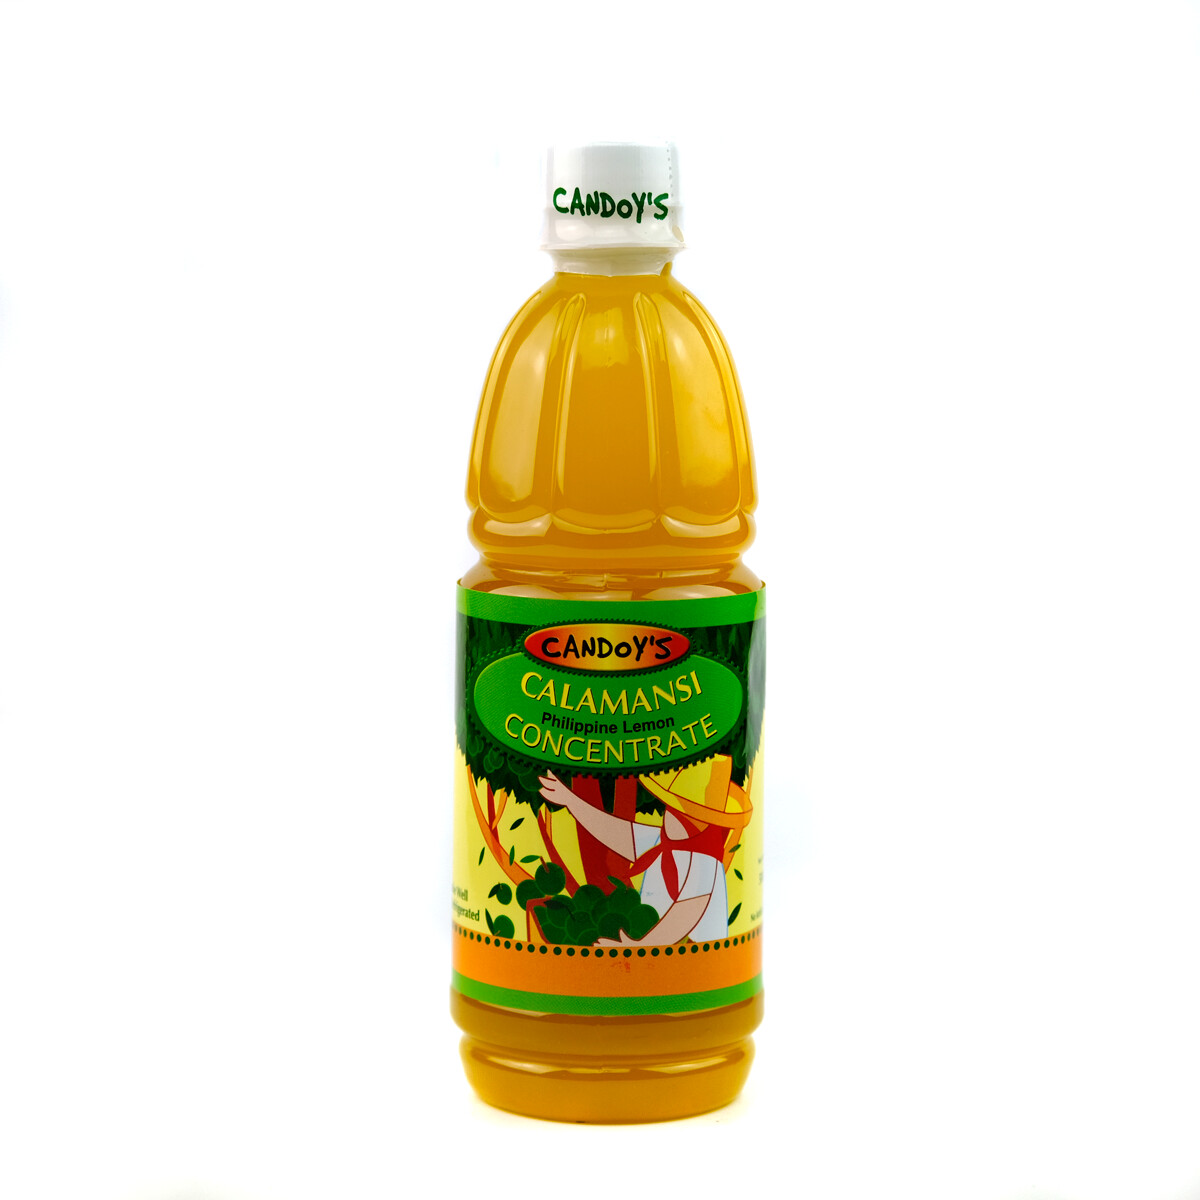 Candoy's Calamansi Juice Concentrate